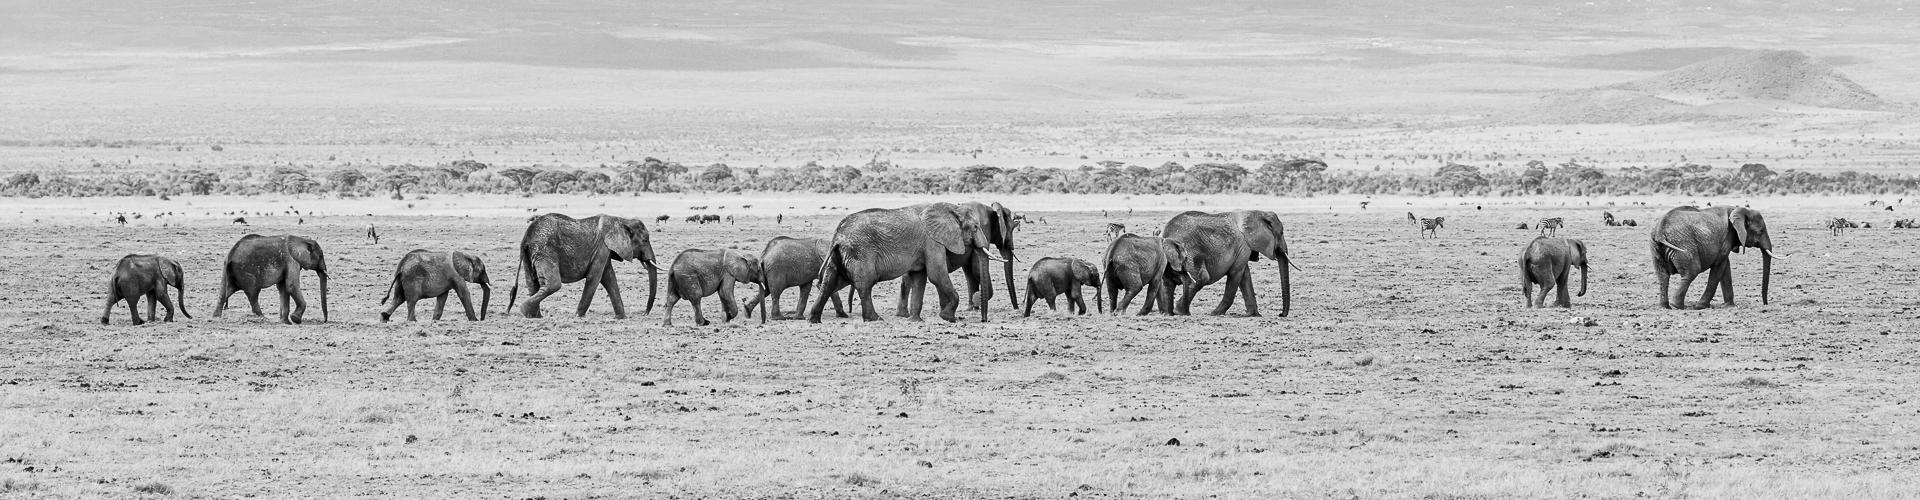 Wildlife Photography: animals around the world